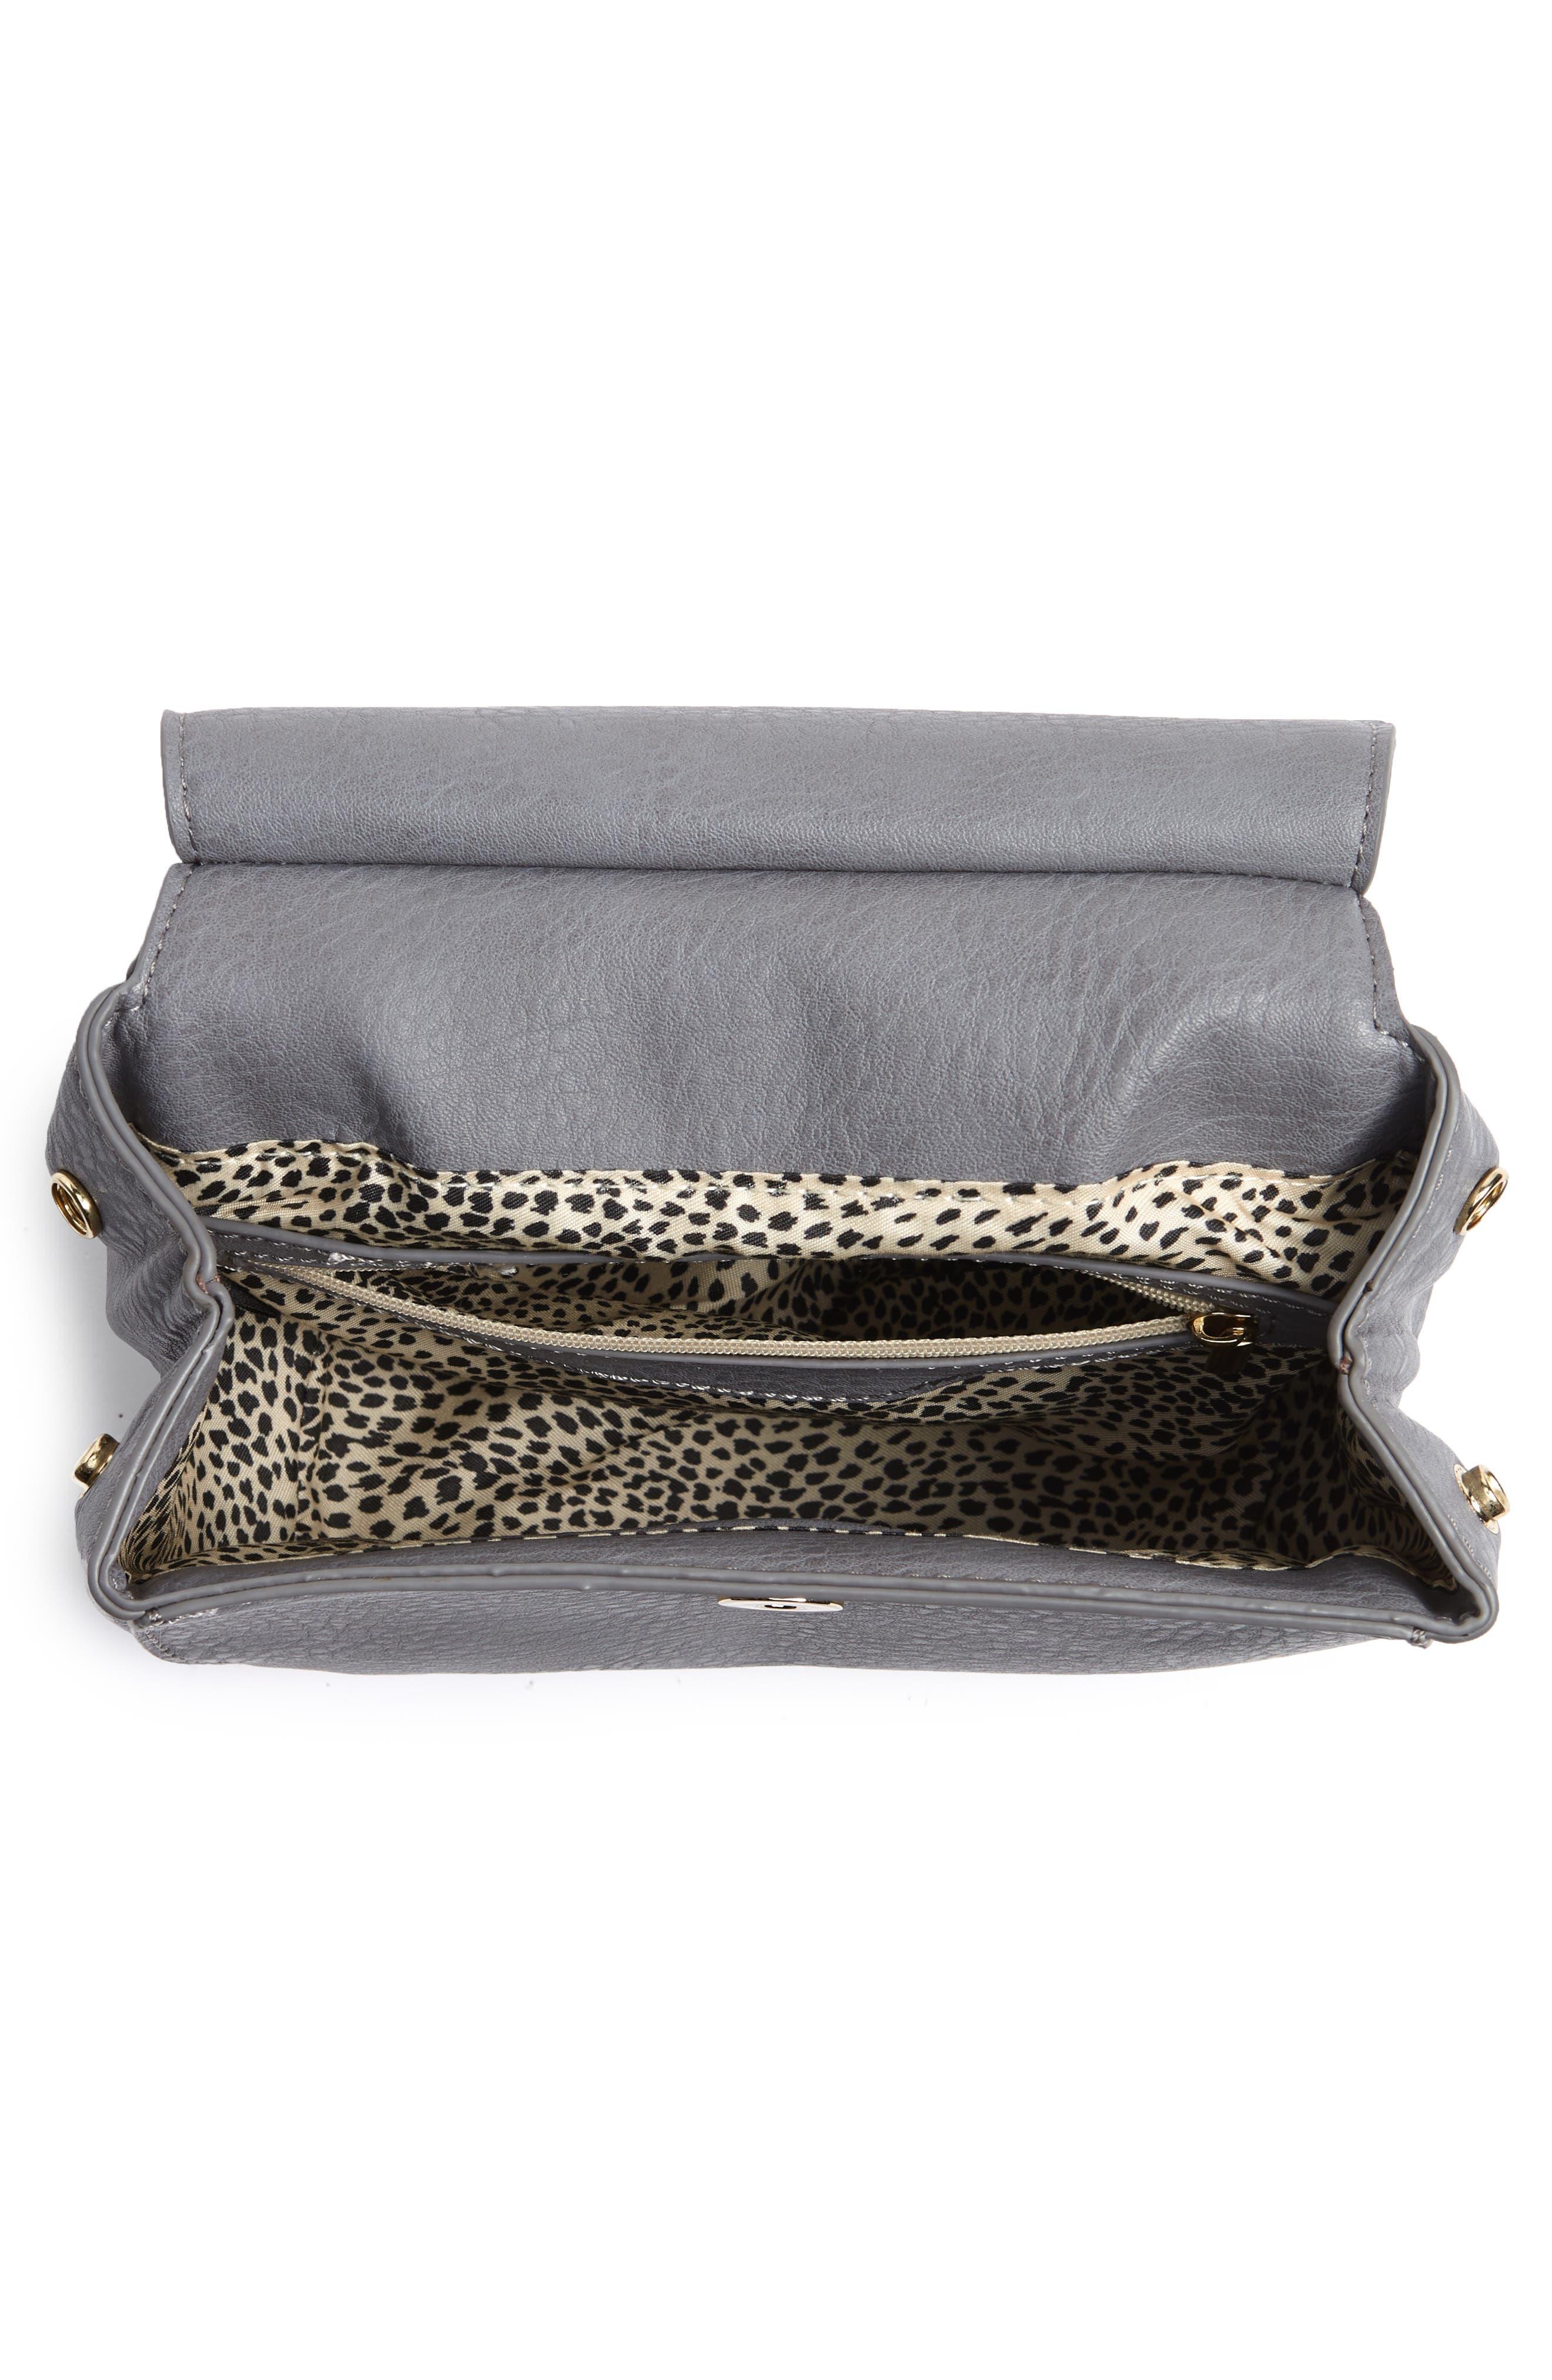 Tassel Faux Leather Crossbody Saddle Bag,                             Alternate thumbnail 7, color,